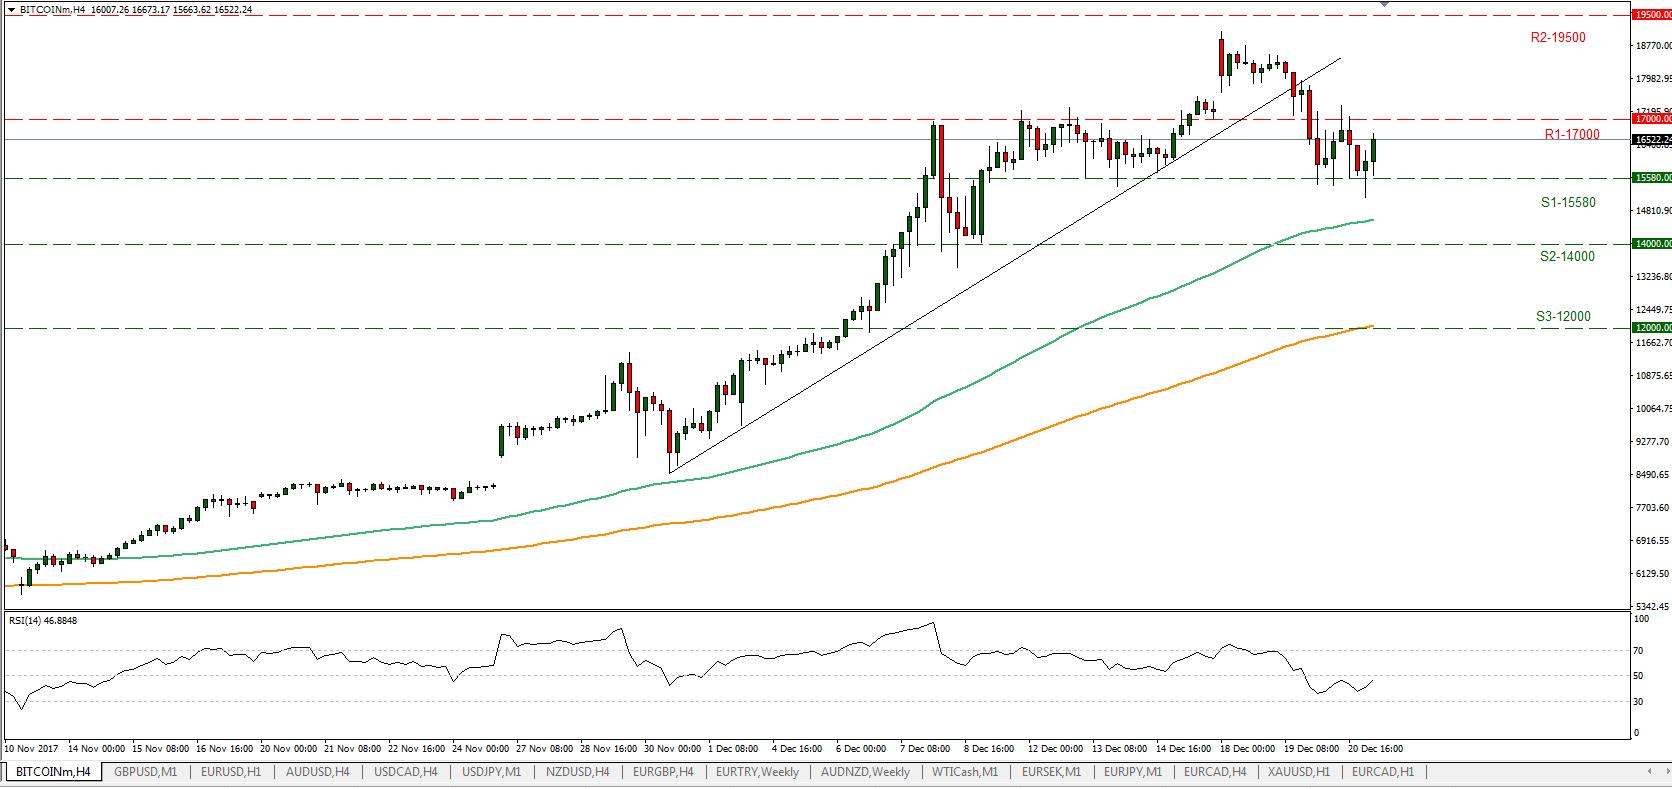 BTC/USD 21/12/2017 | Econ Alerts